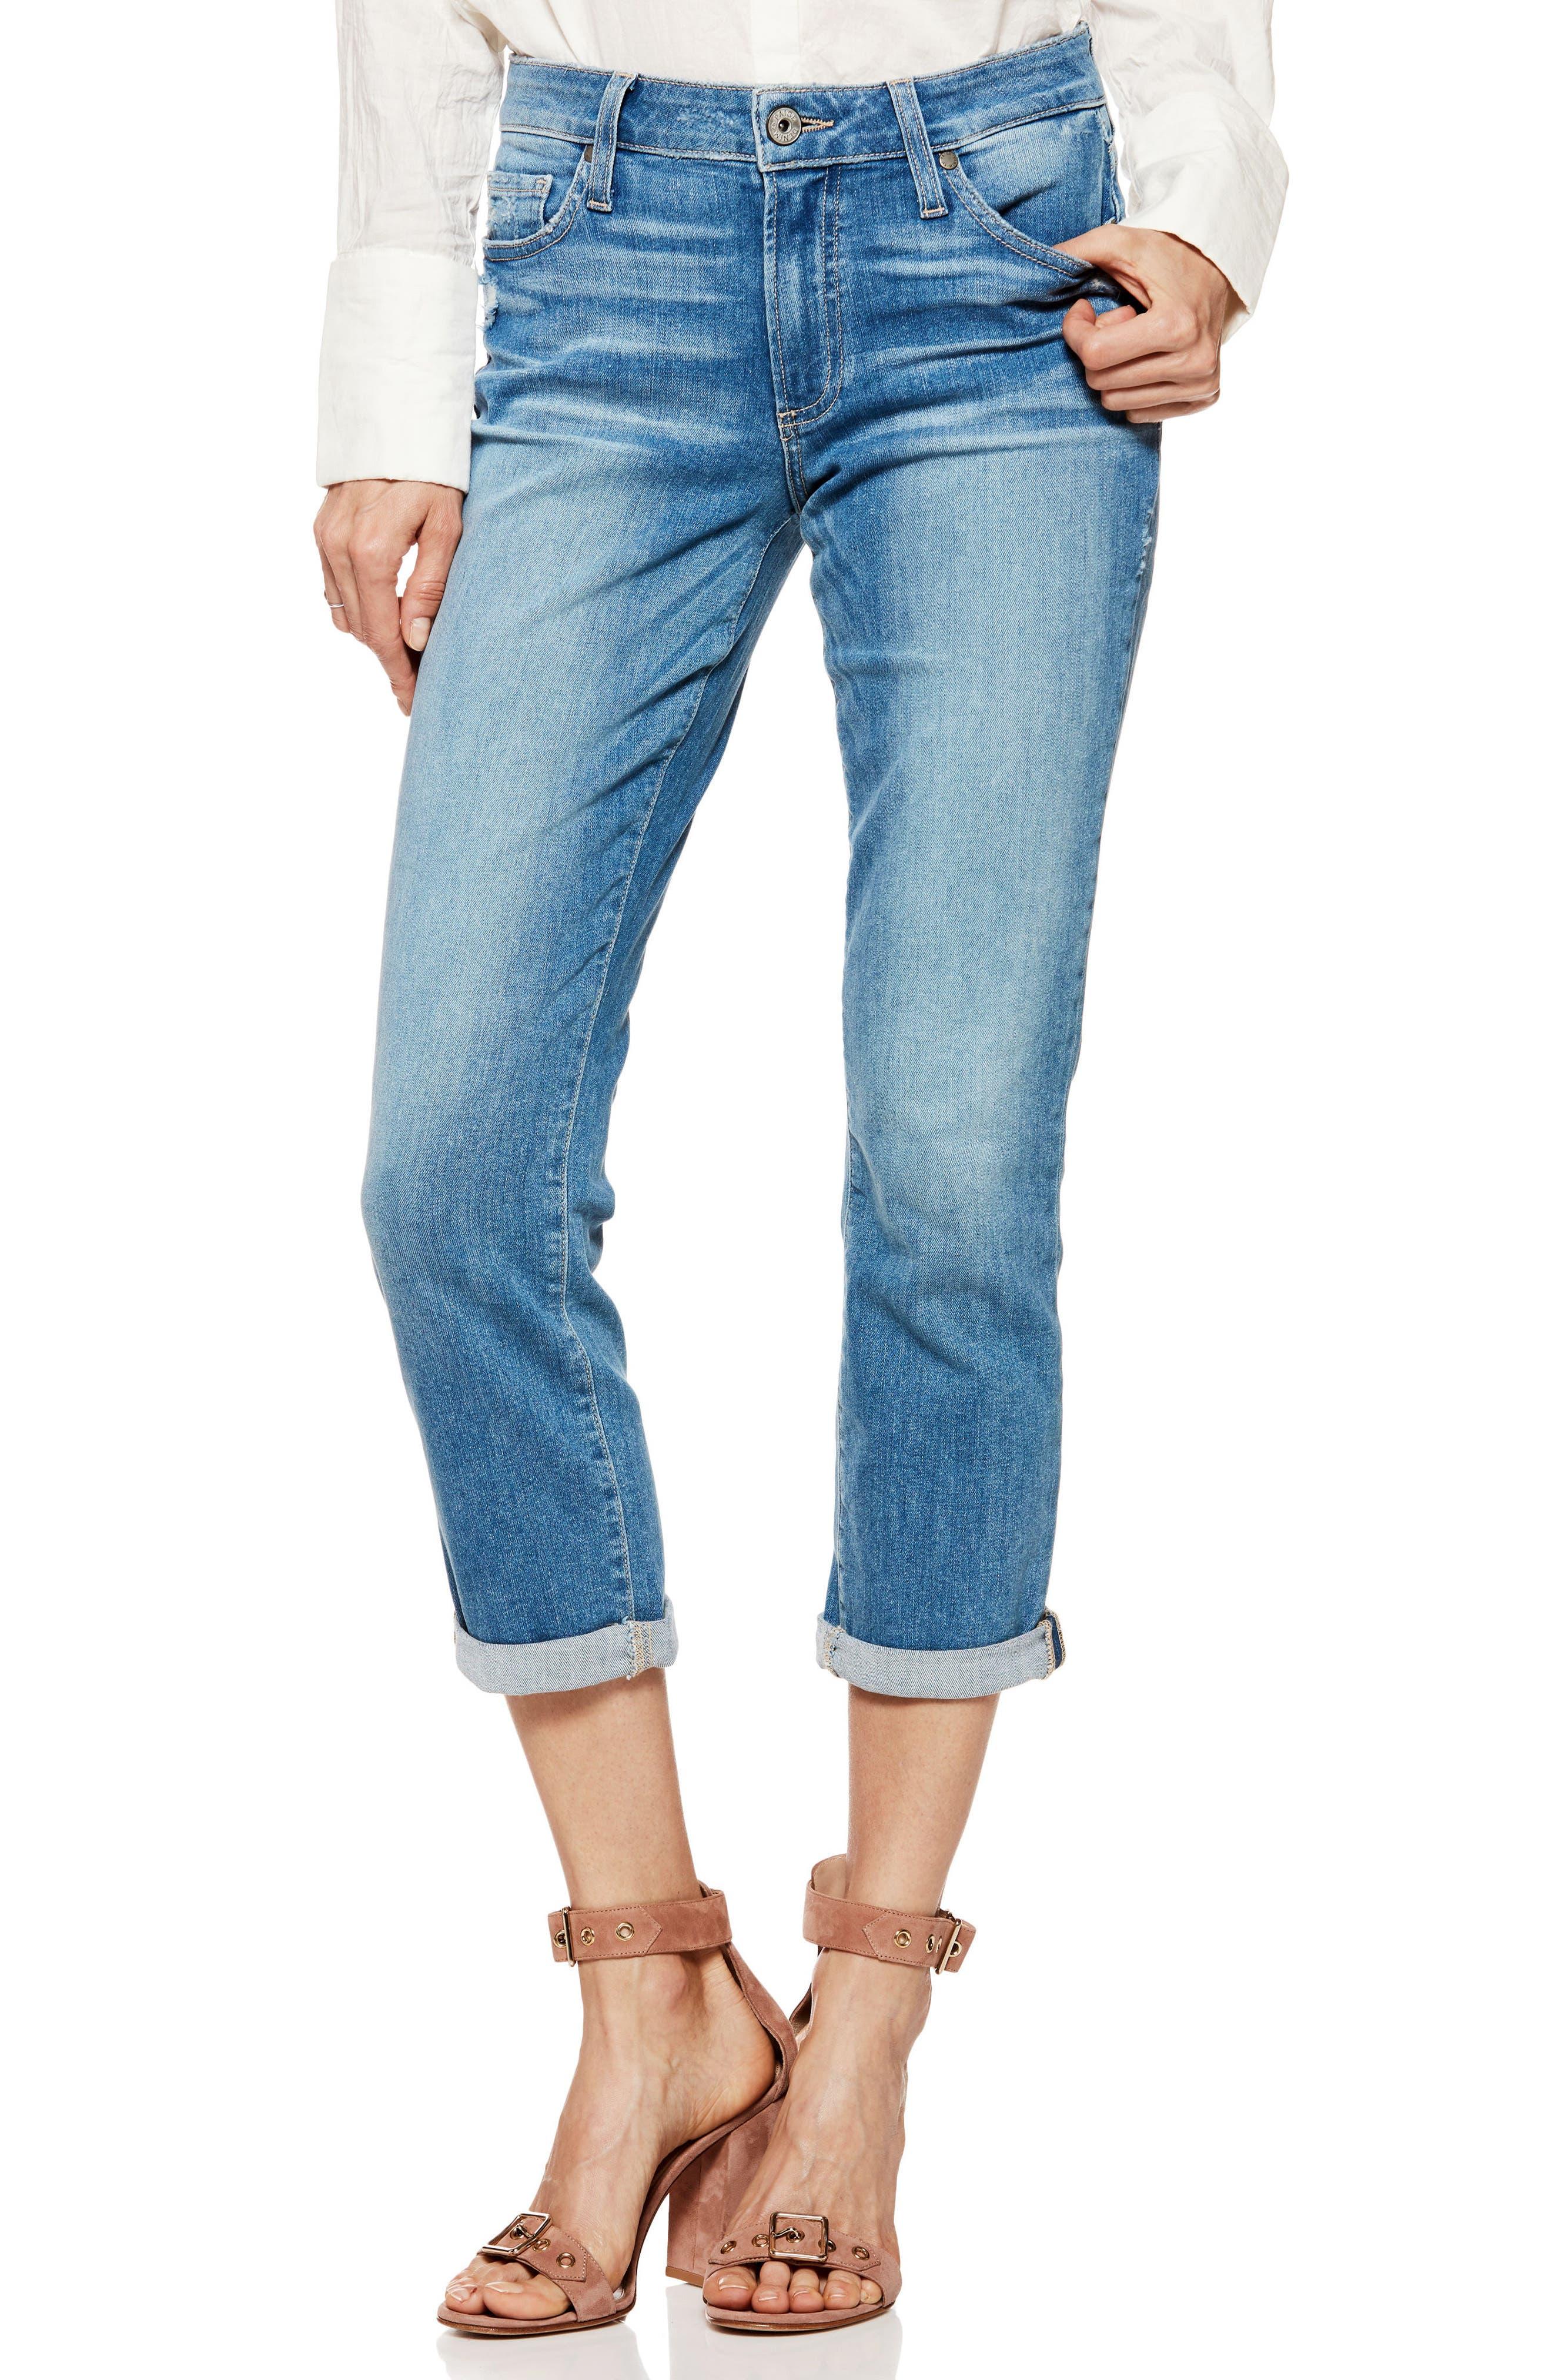 Transcend Vintage - Jimmy Jimmy High Waist Crop Boyfriend Jeans,                         Main,                         color, Venice